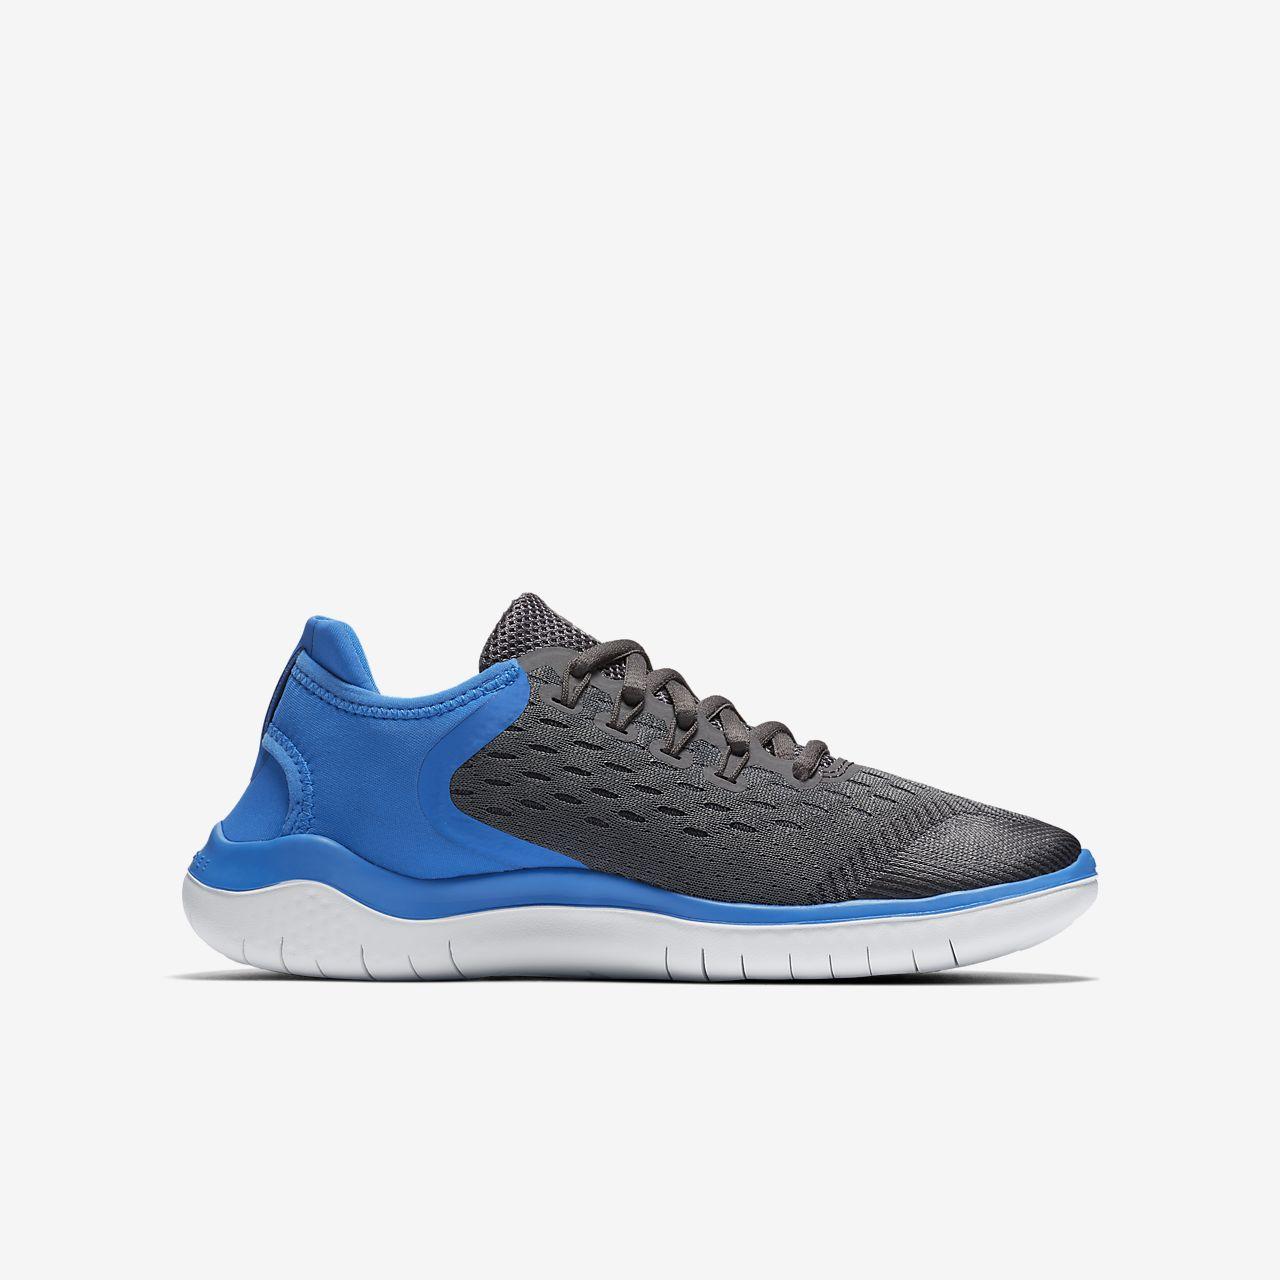 27adb84b7518 Nike Free RN 2018 Older Kids  Running Shoe. Nike.com RO